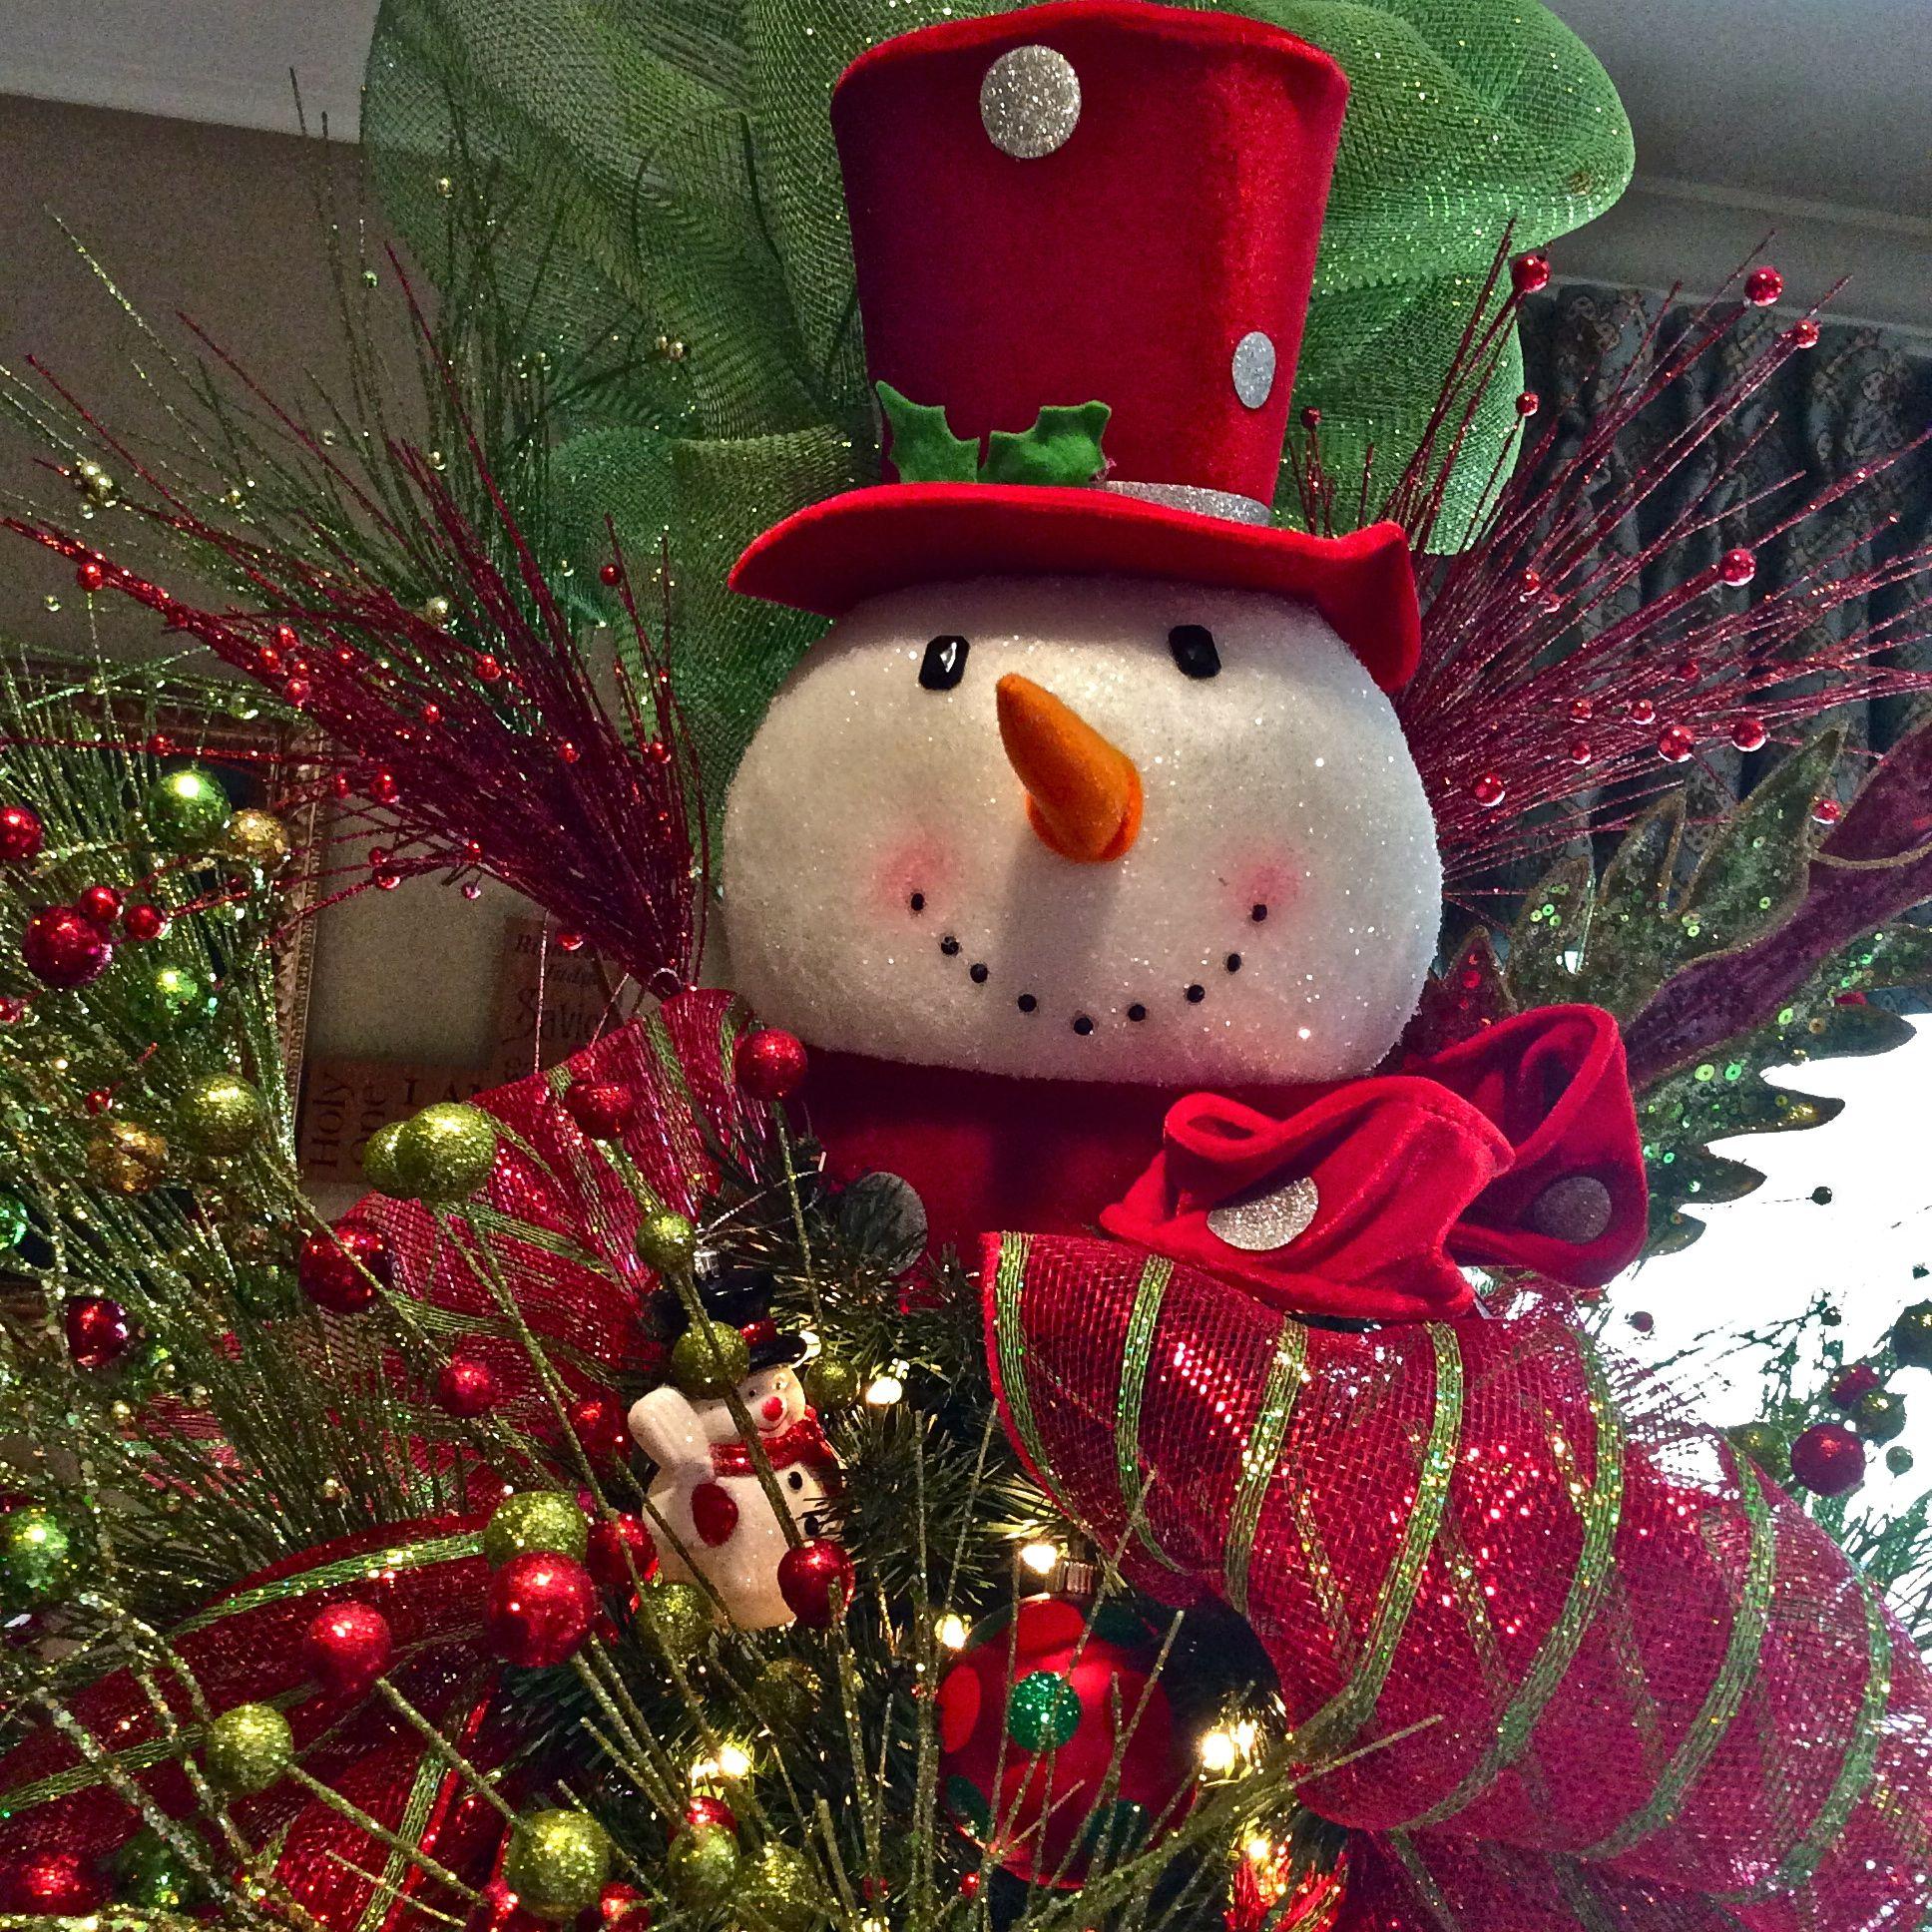 snowman tree topper craft ideas pinterest. Black Bedroom Furniture Sets. Home Design Ideas